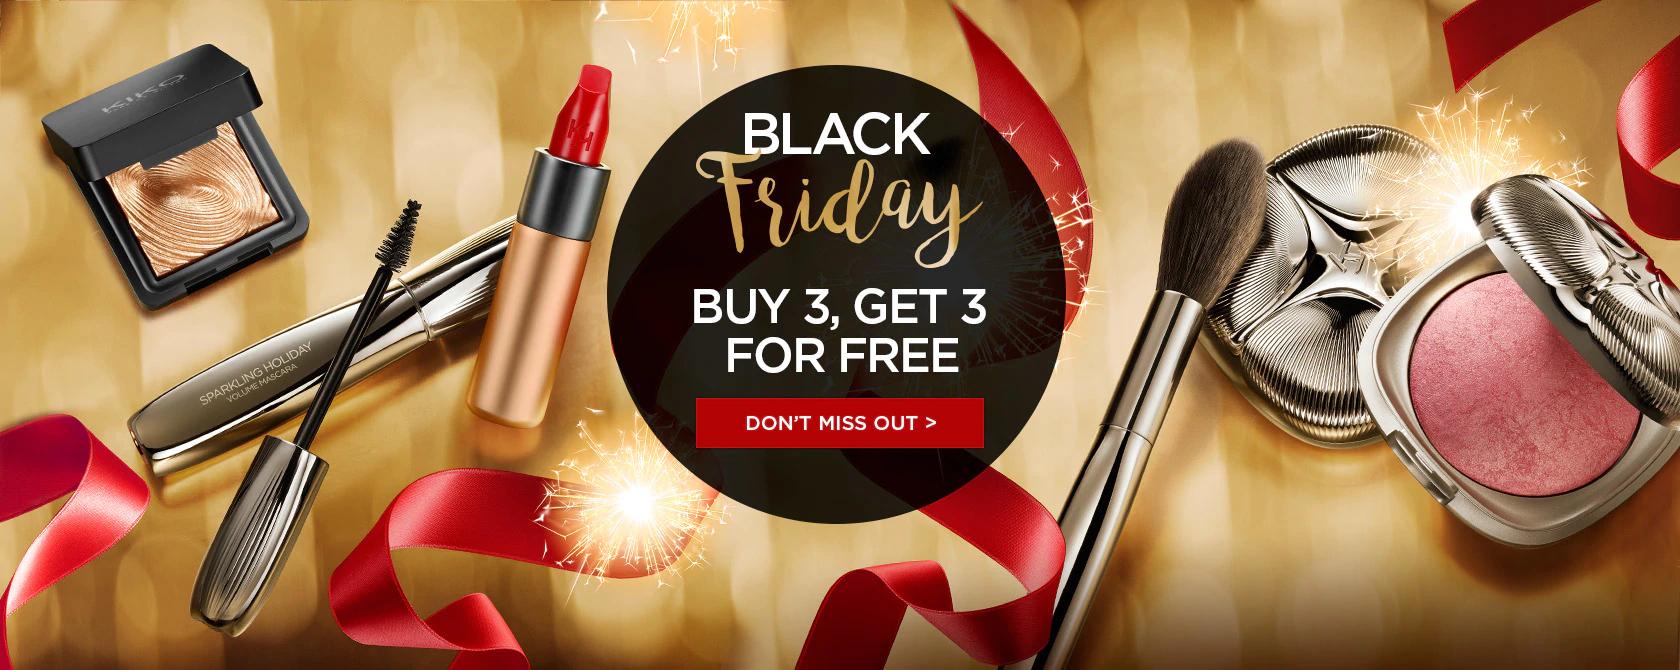 Kiko Milano - Black Friday Deal - BUY 3 Get 3 FREE